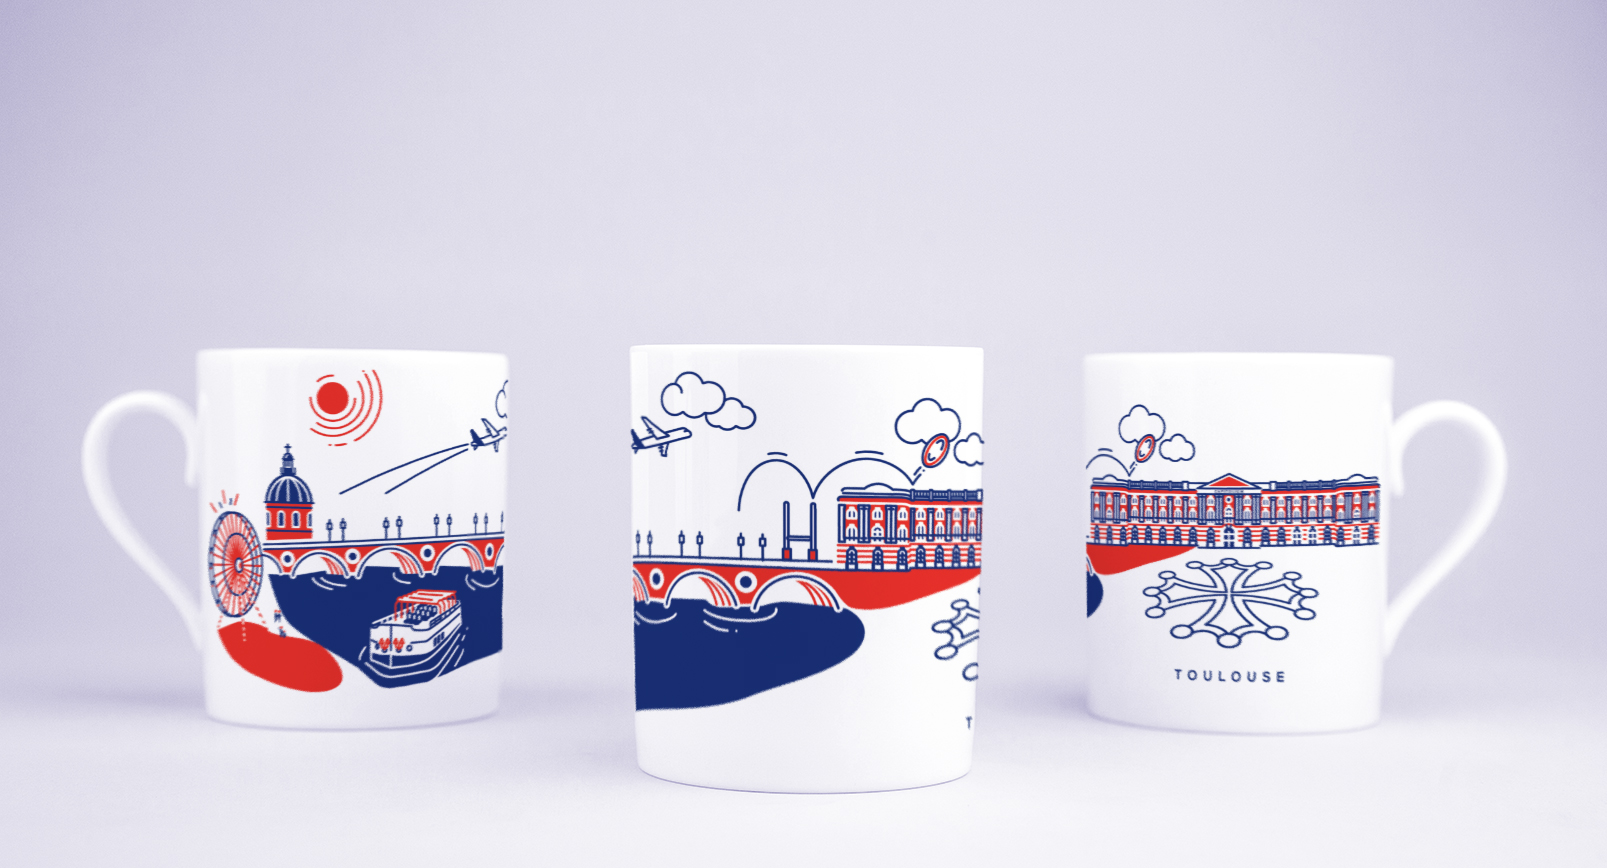 Vue du motif complet du mug Toulouse